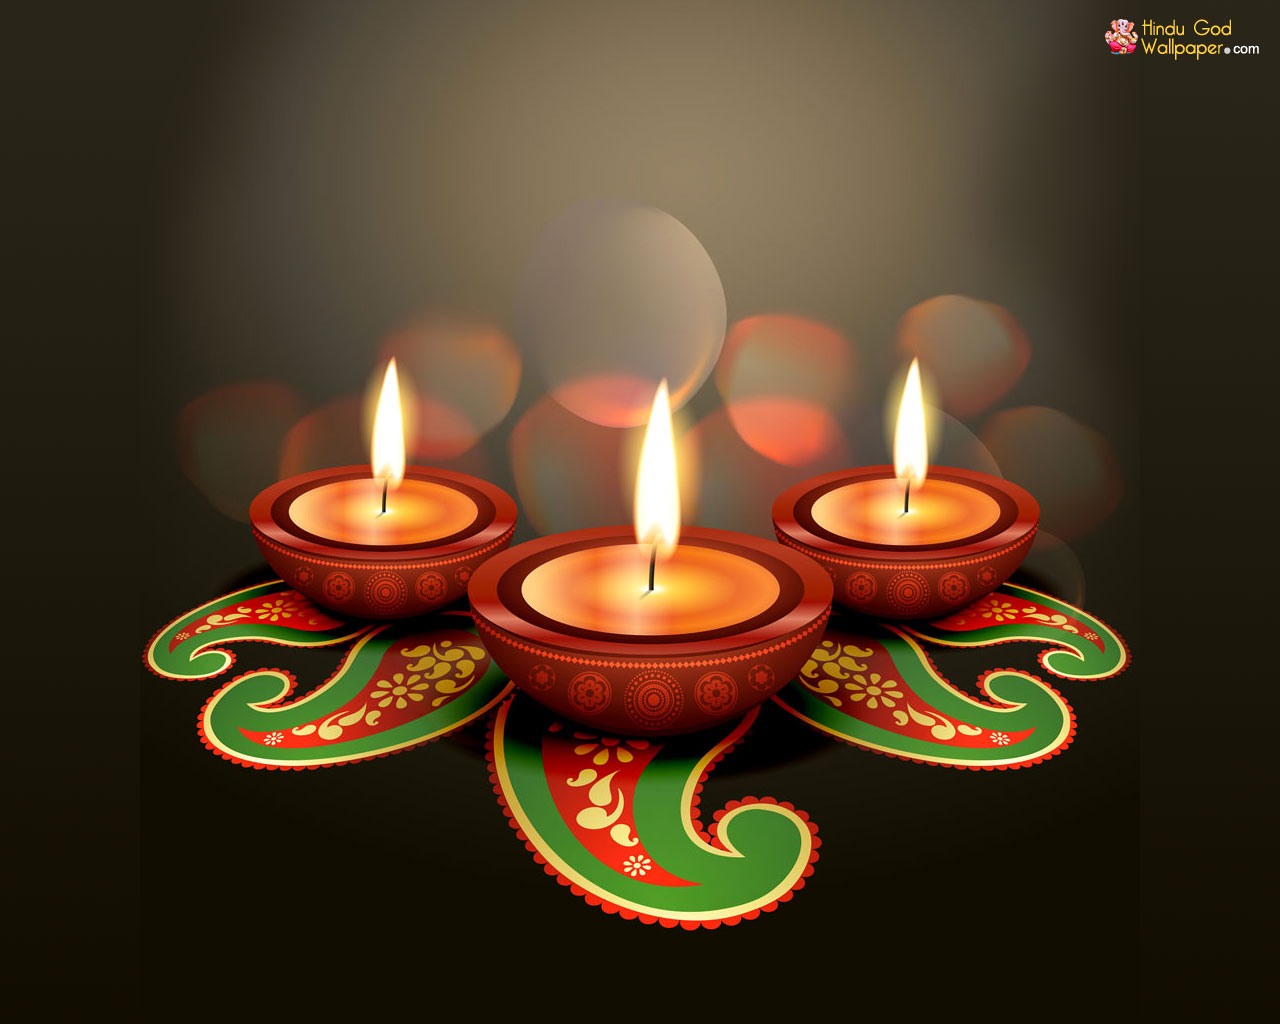 Happy Diwali Wallpaper 3d 2015 Happy Deepawali Lights Diyas Decoration Ideas 2015 Images